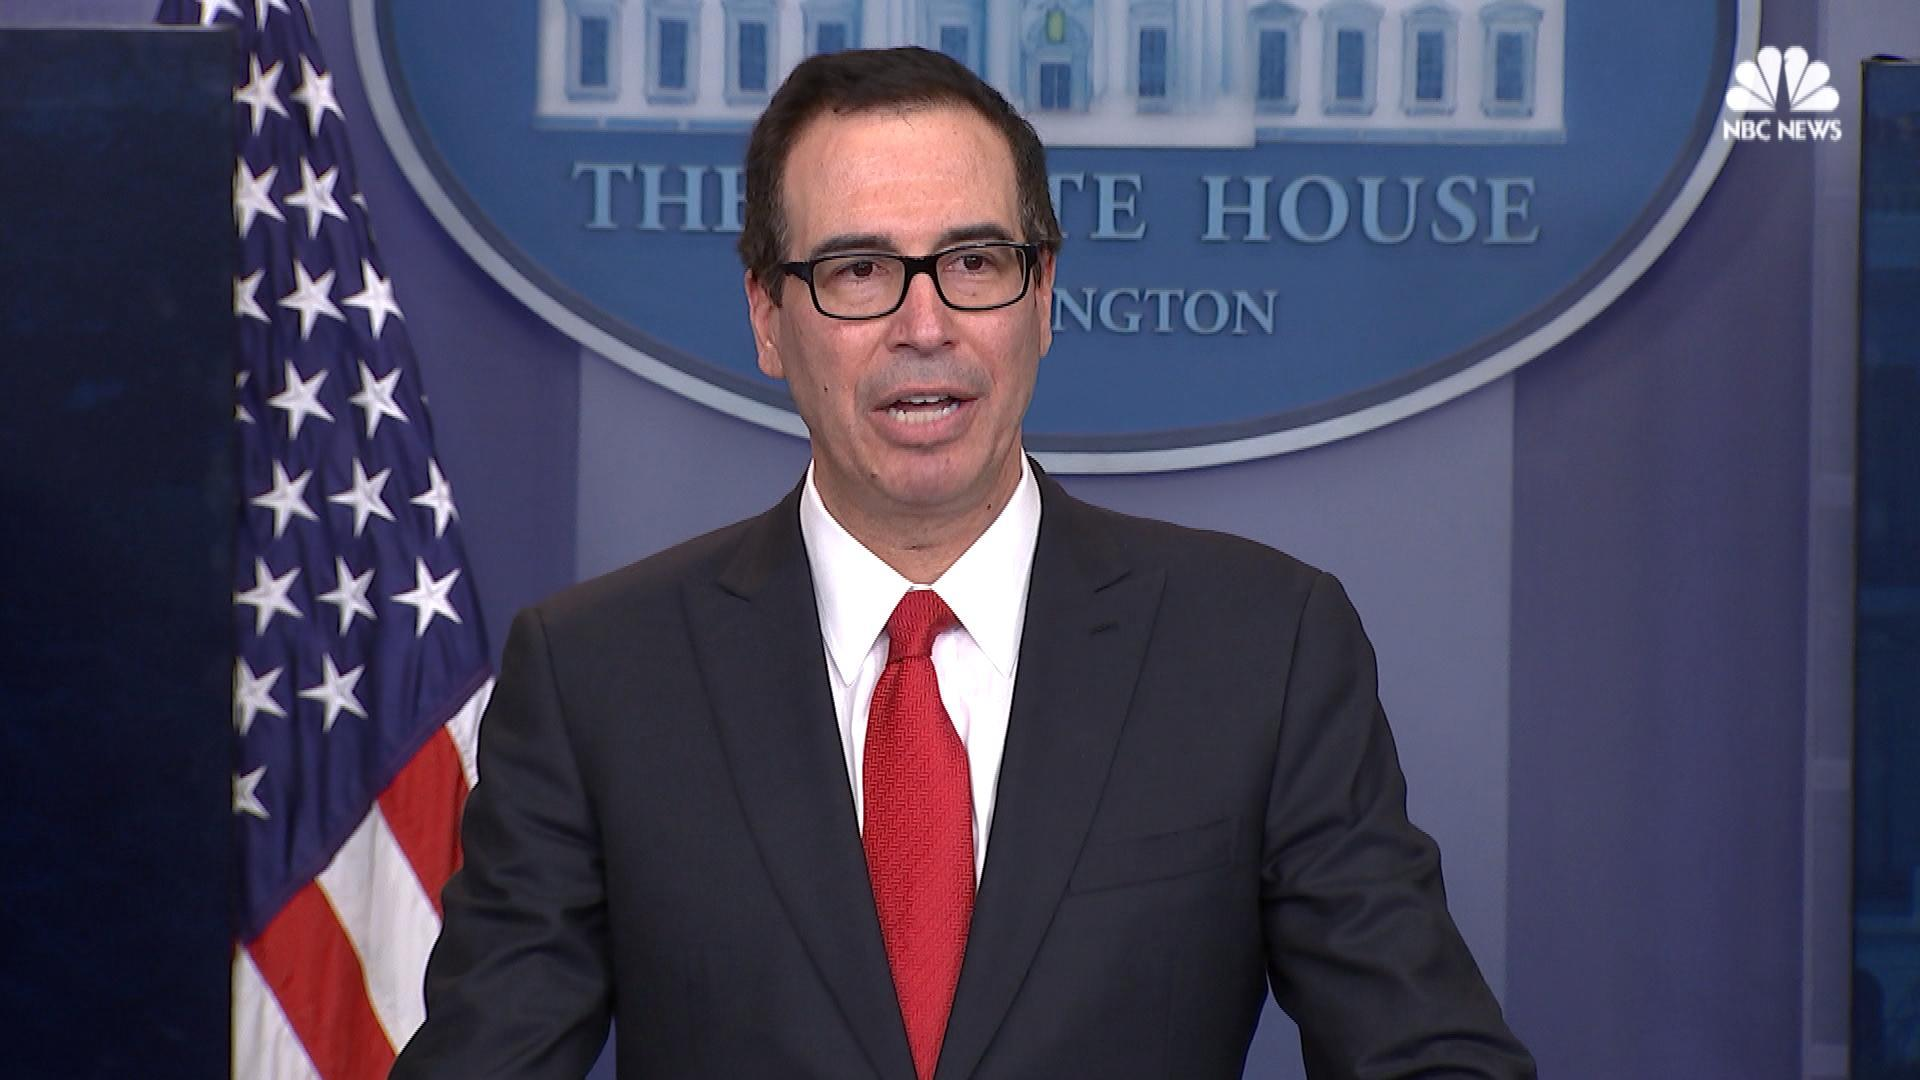 Secretary of the Treasury Steven Mnuchin unveiling Trump's Tax Plan last Wednesday. Source: NBC